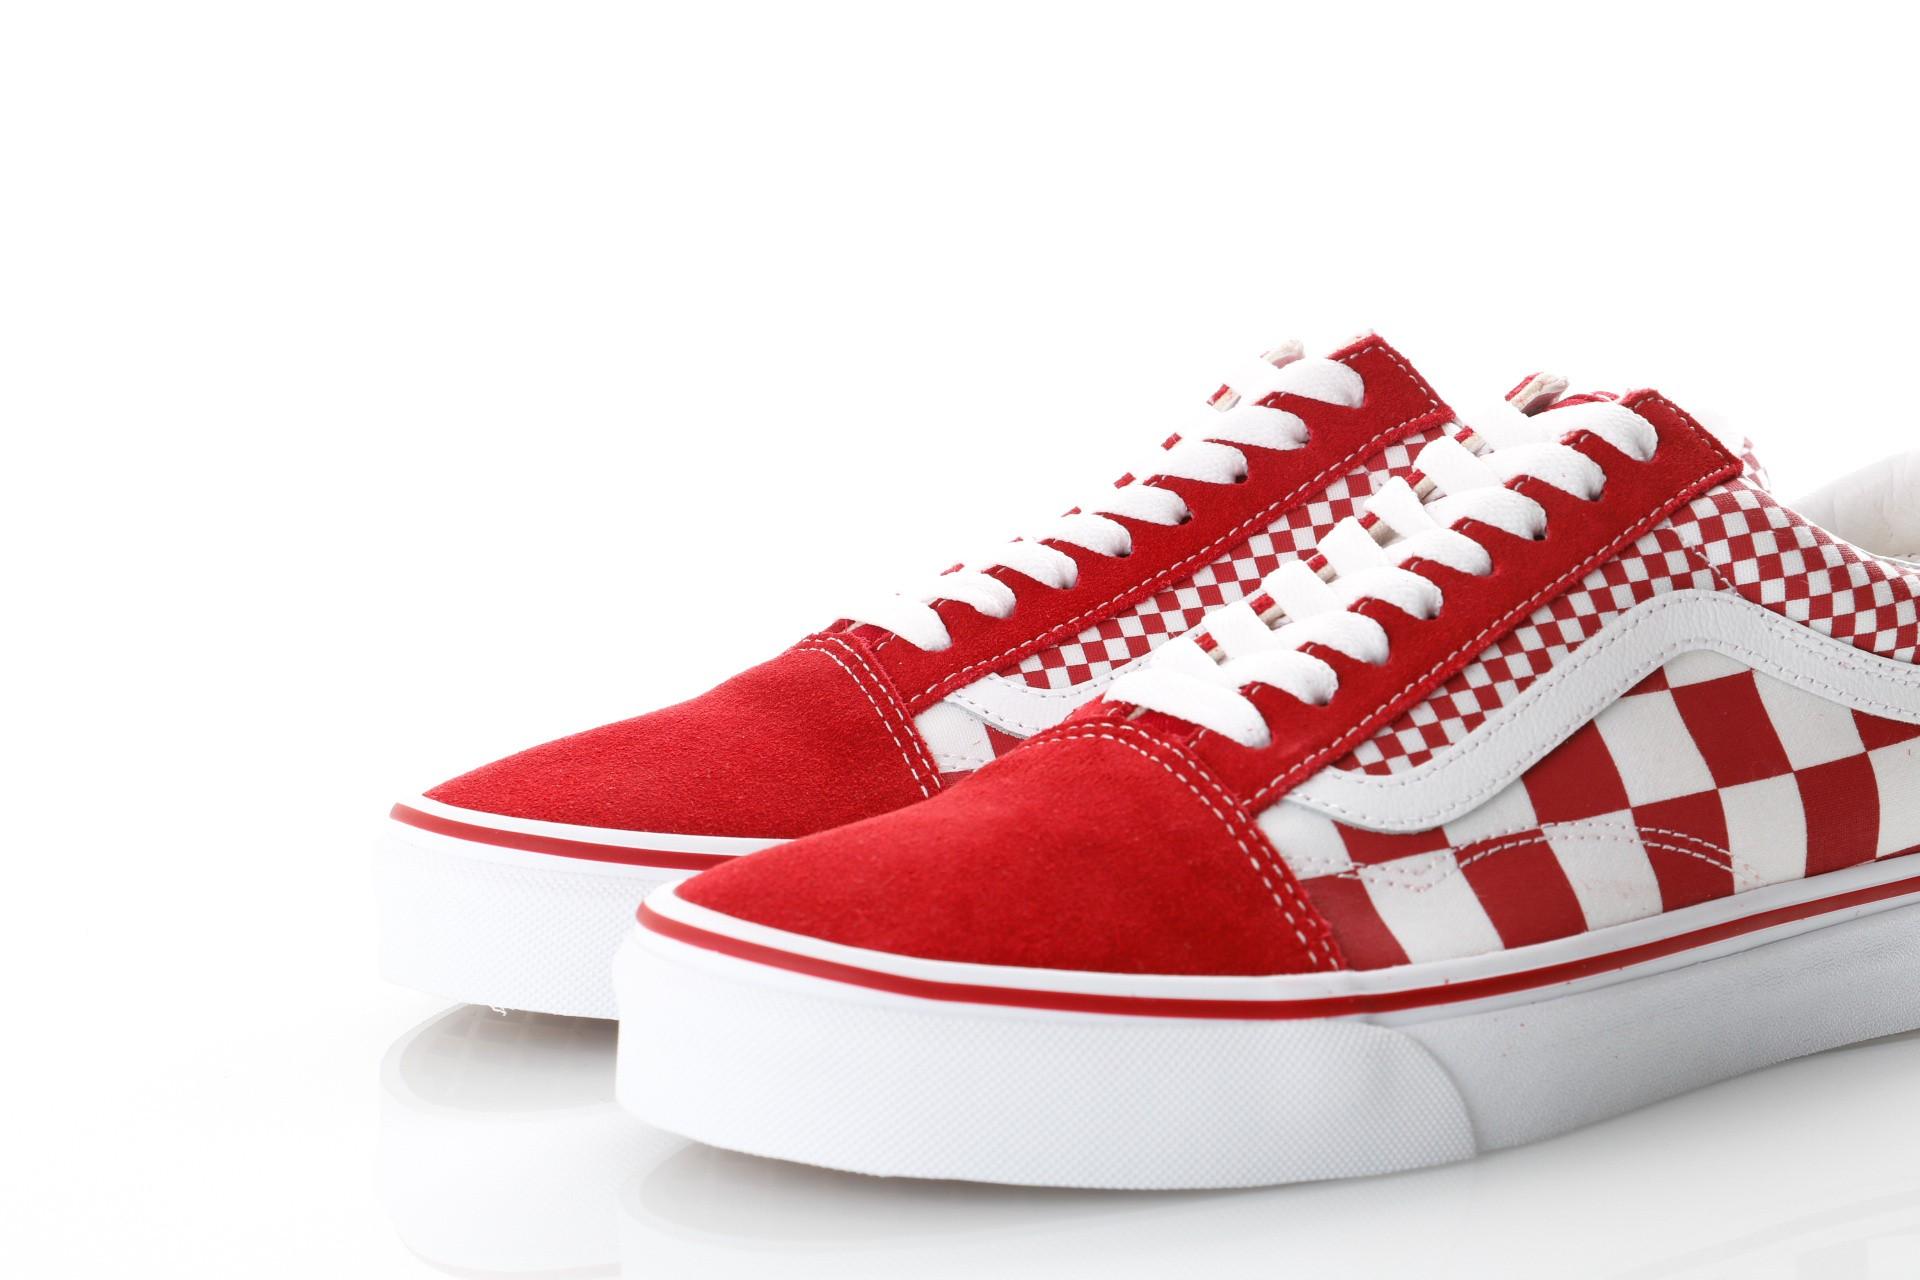 1f4a0a021bc Afbeelding van Vans Ua Old Skool Vn0A38G1Vk5 Sneakers (Mix Checker) Chili  Pepper True